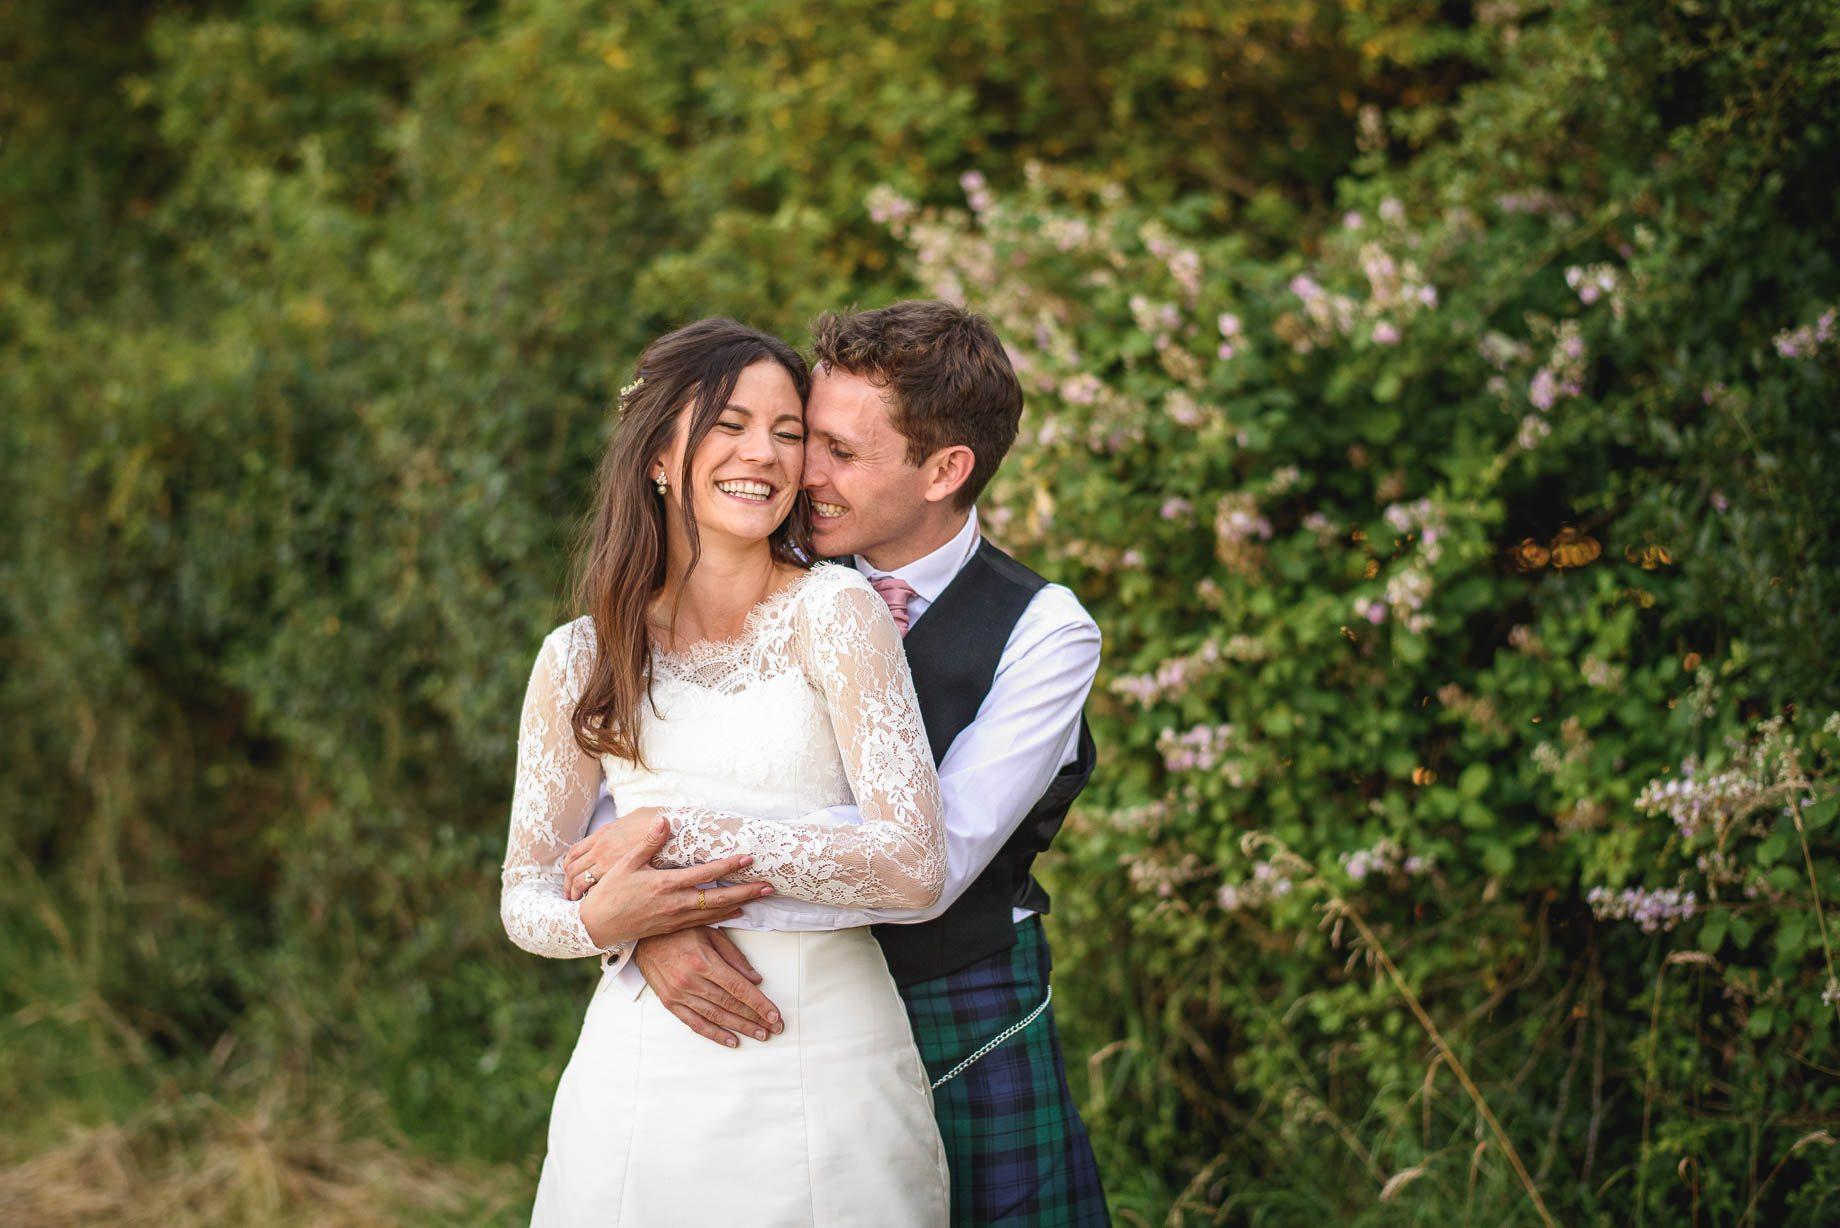 Gildings Barn wedding photography - Sarah and Steve (155 of 190)